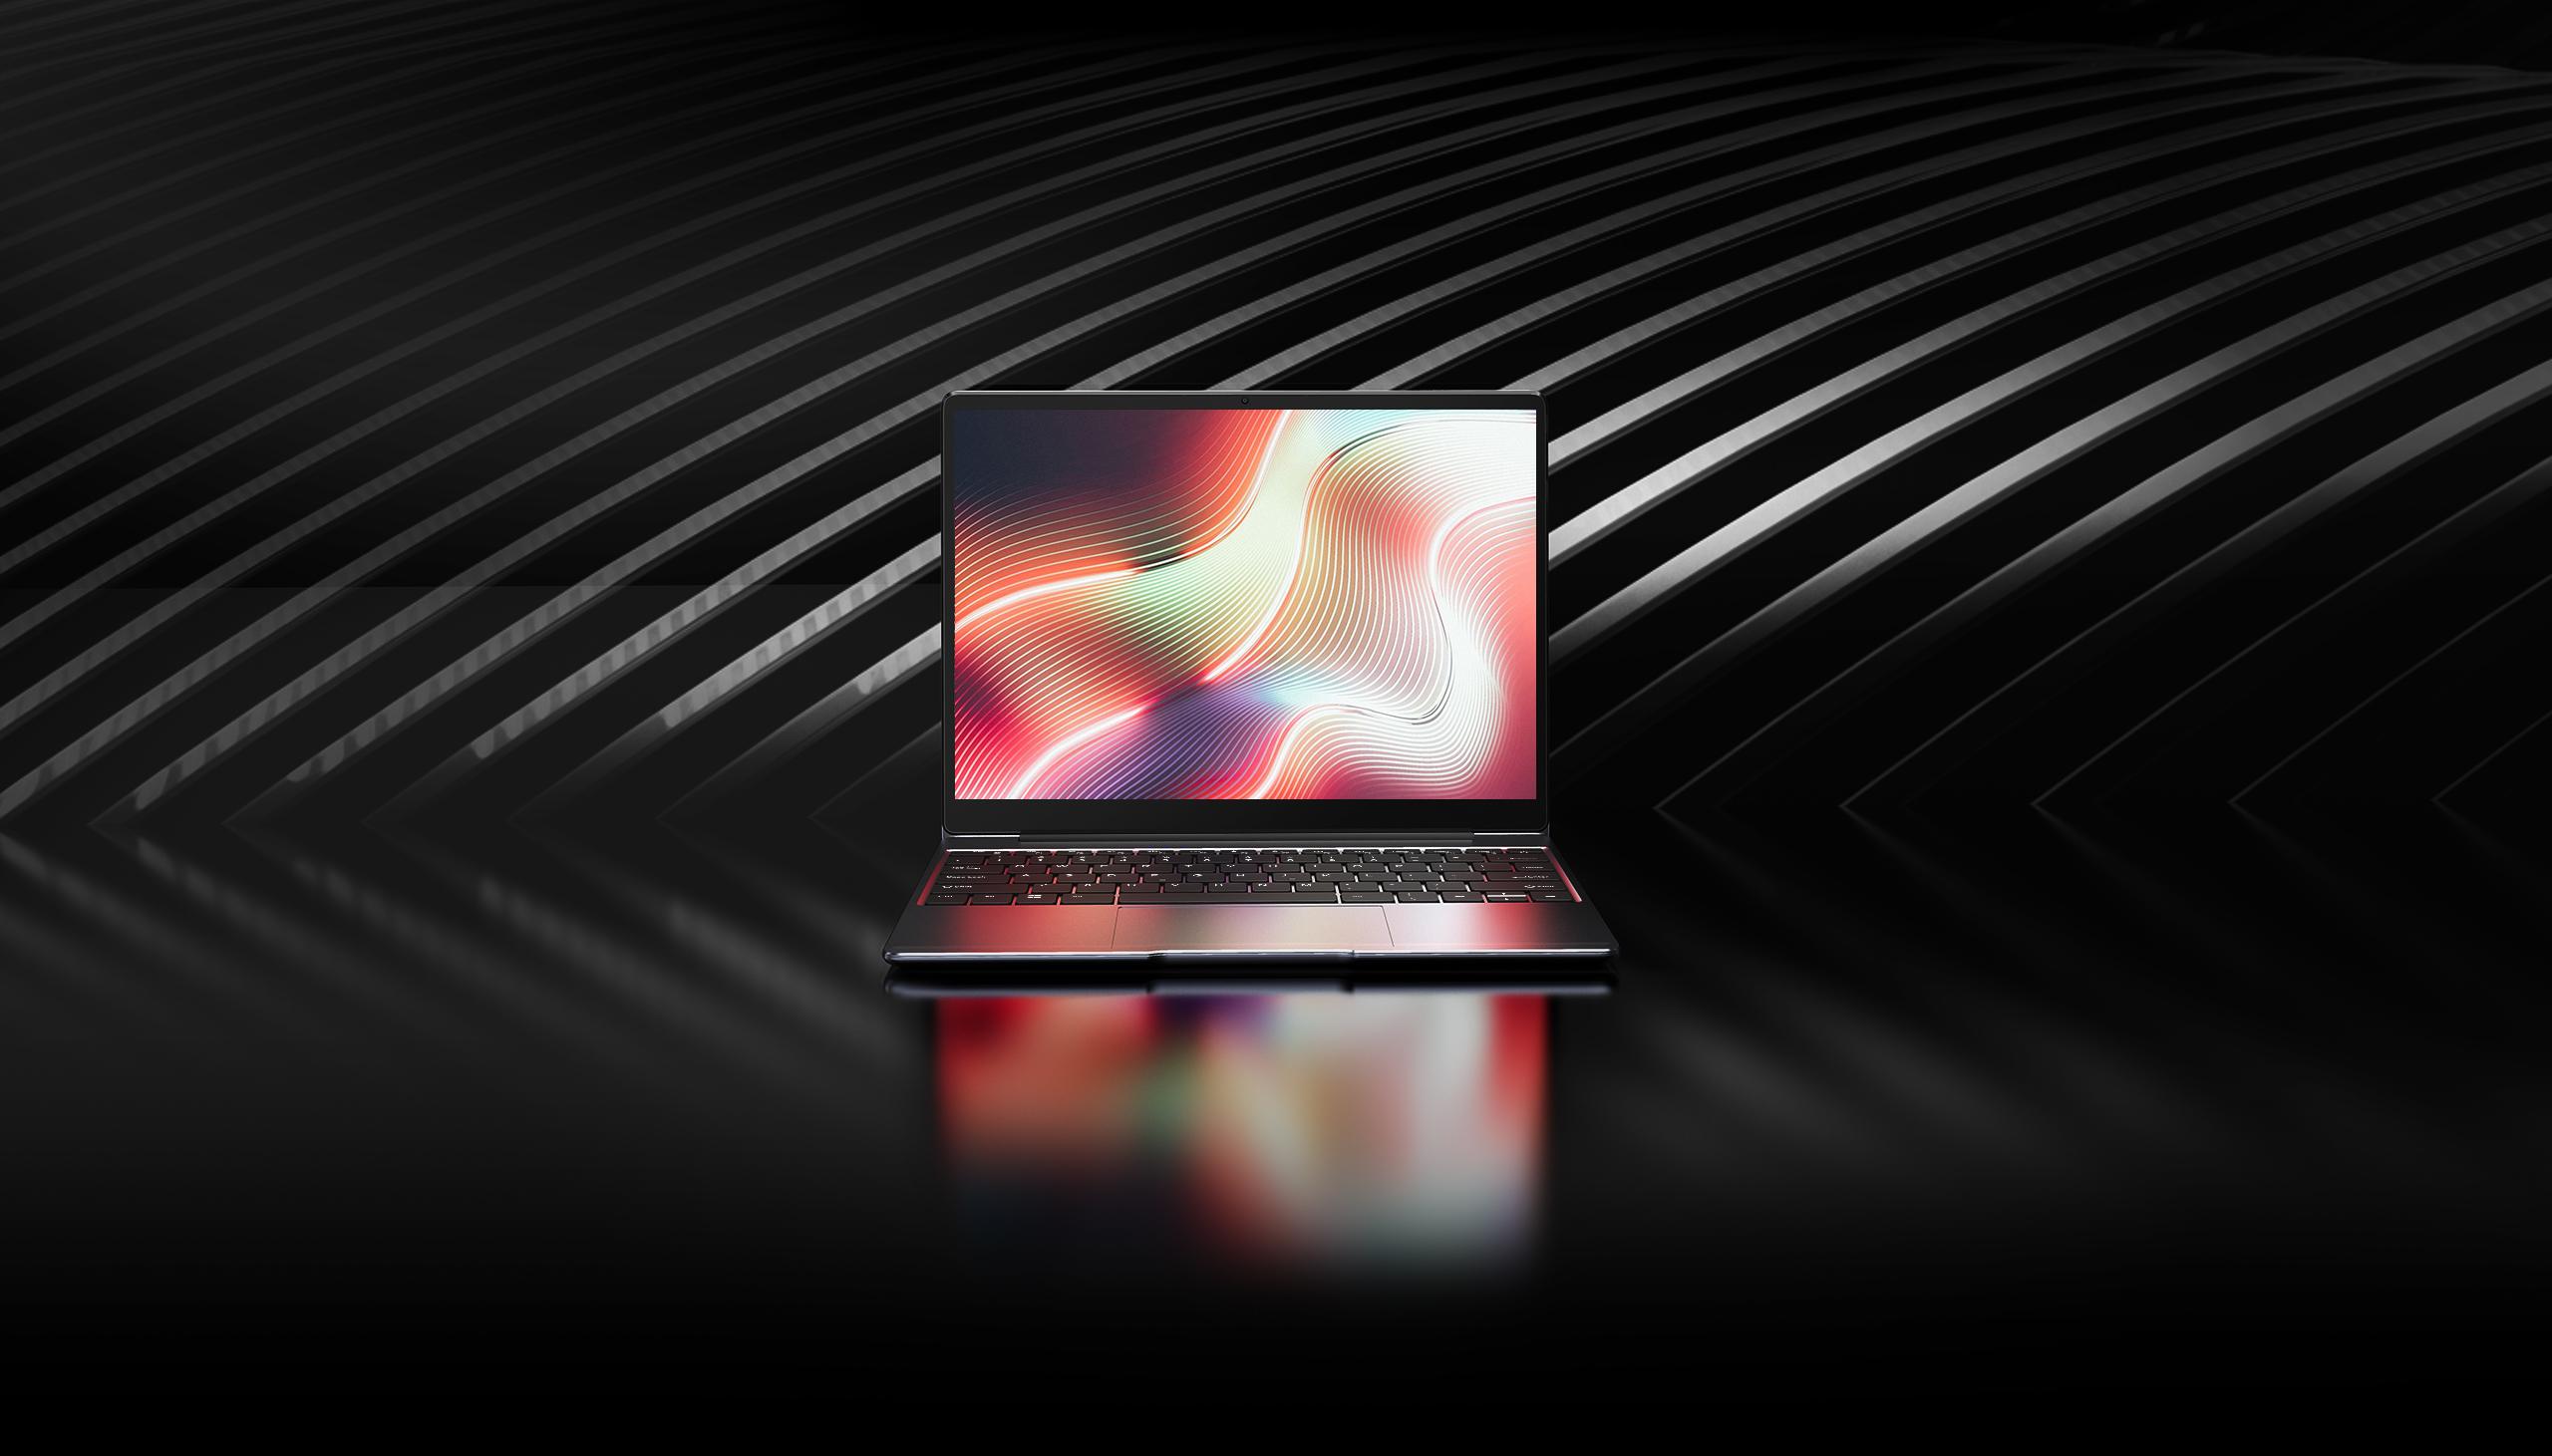 CoreBook X